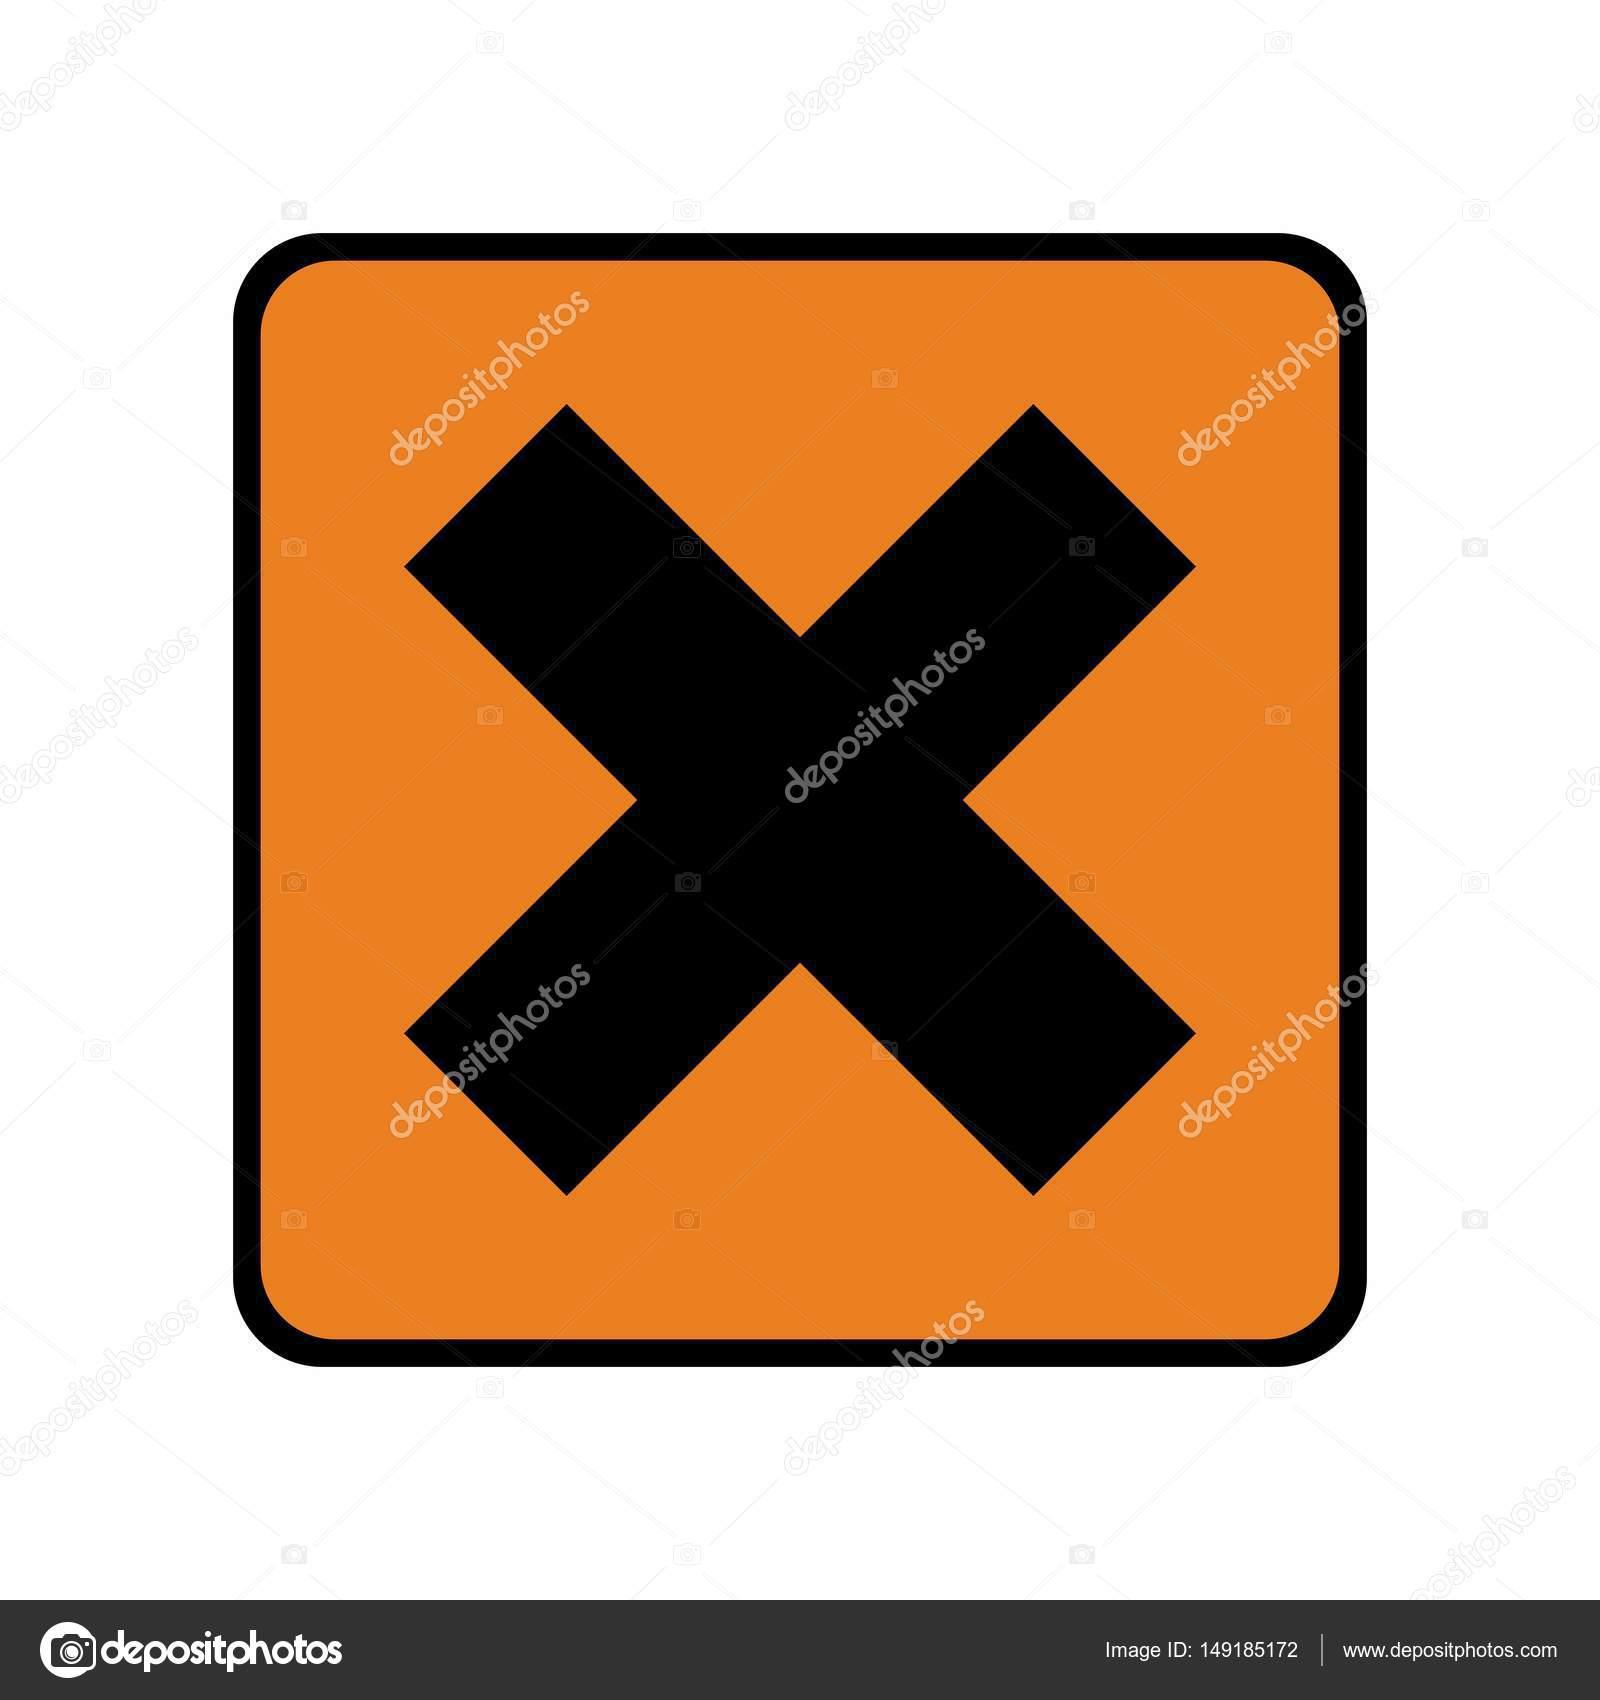 Irritant hazard sign or symbol stock vector dobdeazsoltail irritant hazard sign or symbol stock vector biocorpaavc Gallery